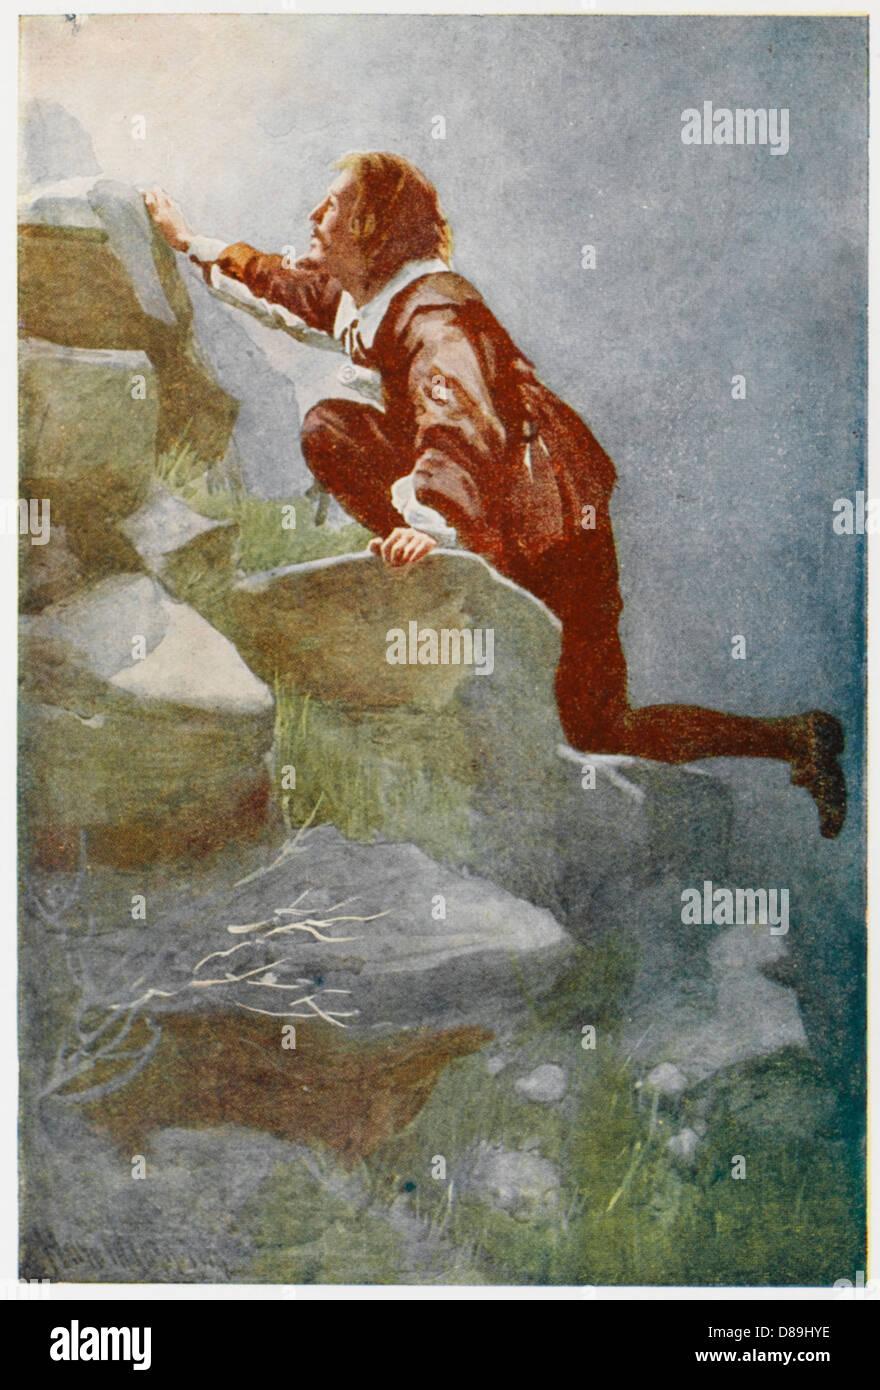 Pilgrims Progress 7 - Stock Image